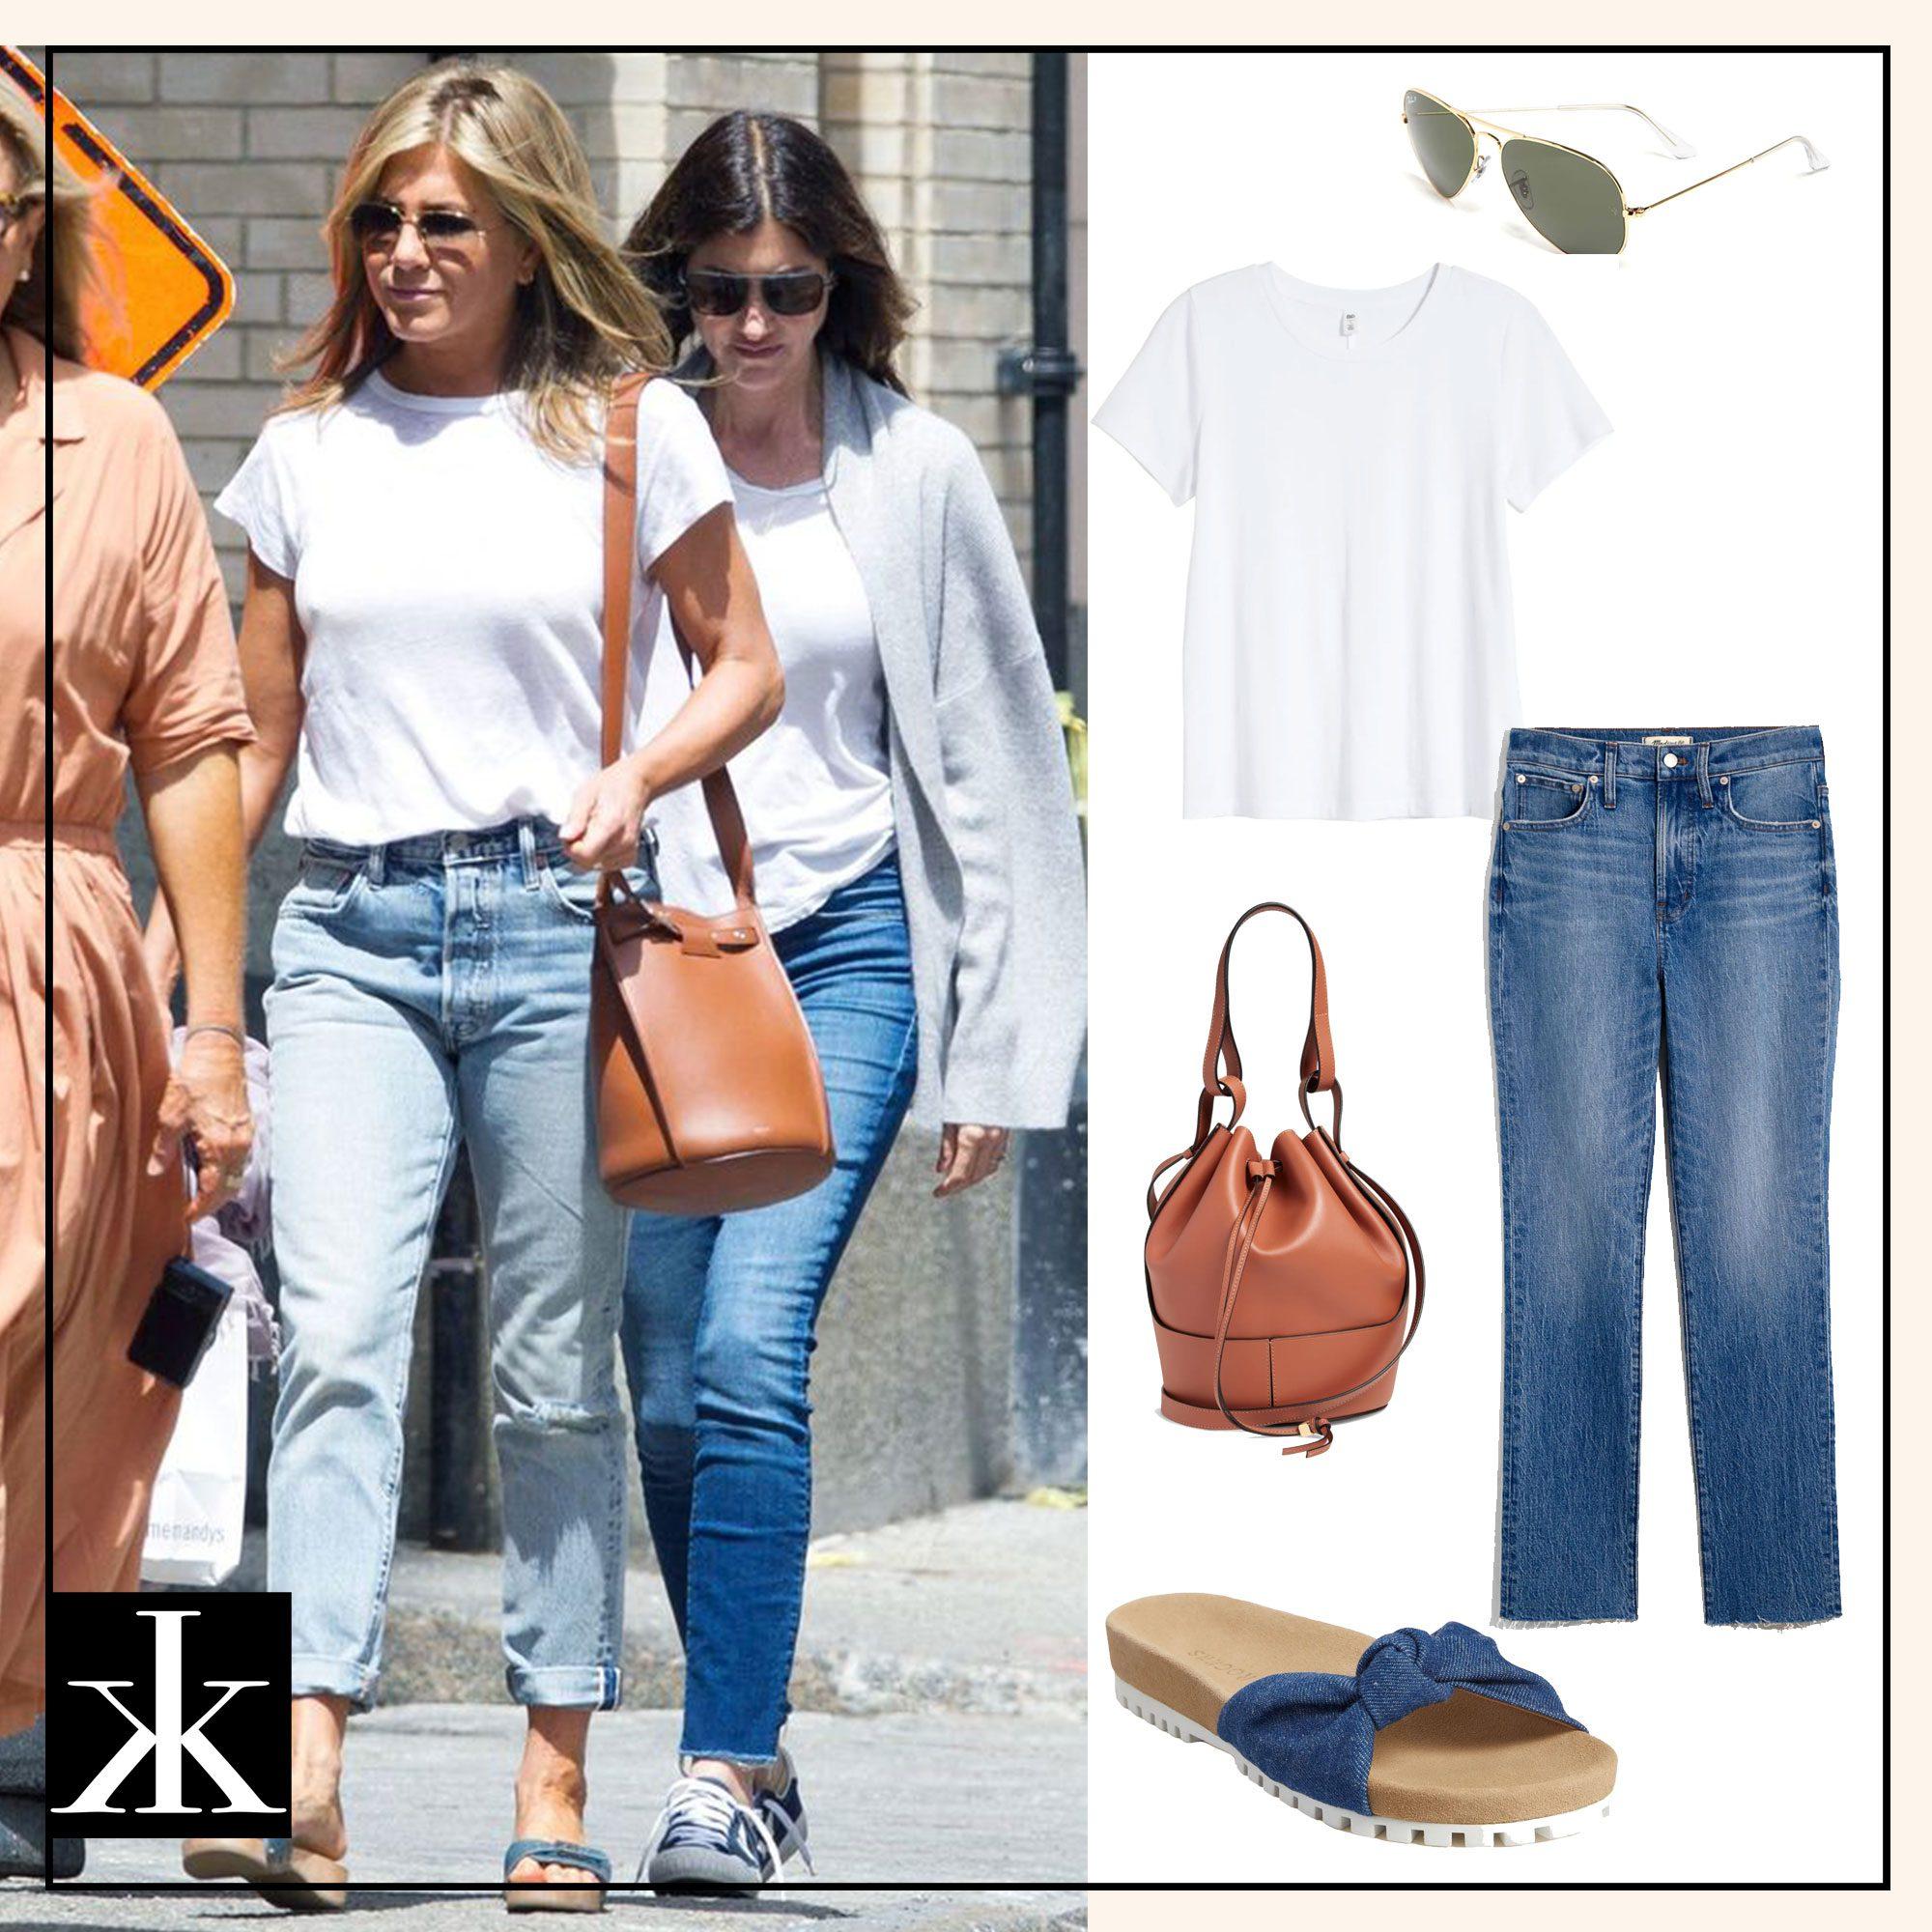 Jennifer Aniston Summer Outfit Inspiration 5